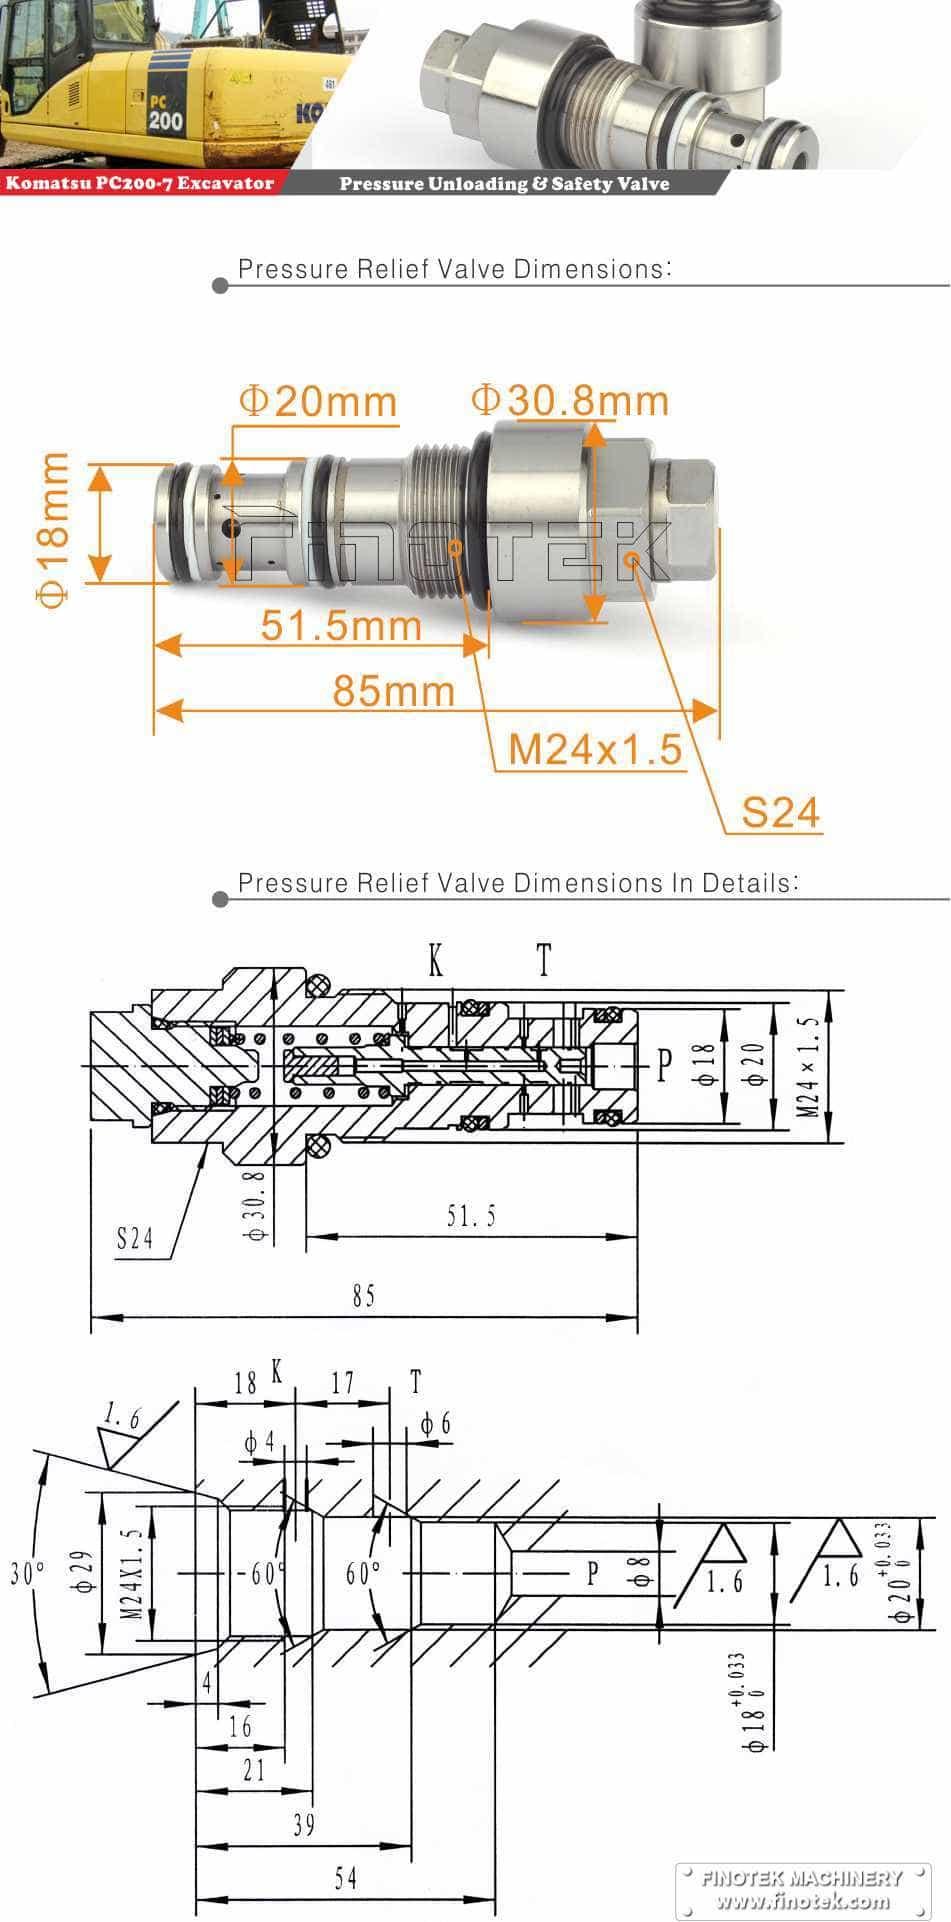 medium resolution of komatsu pc200 7 8 excavator safety valve pressure safety valve